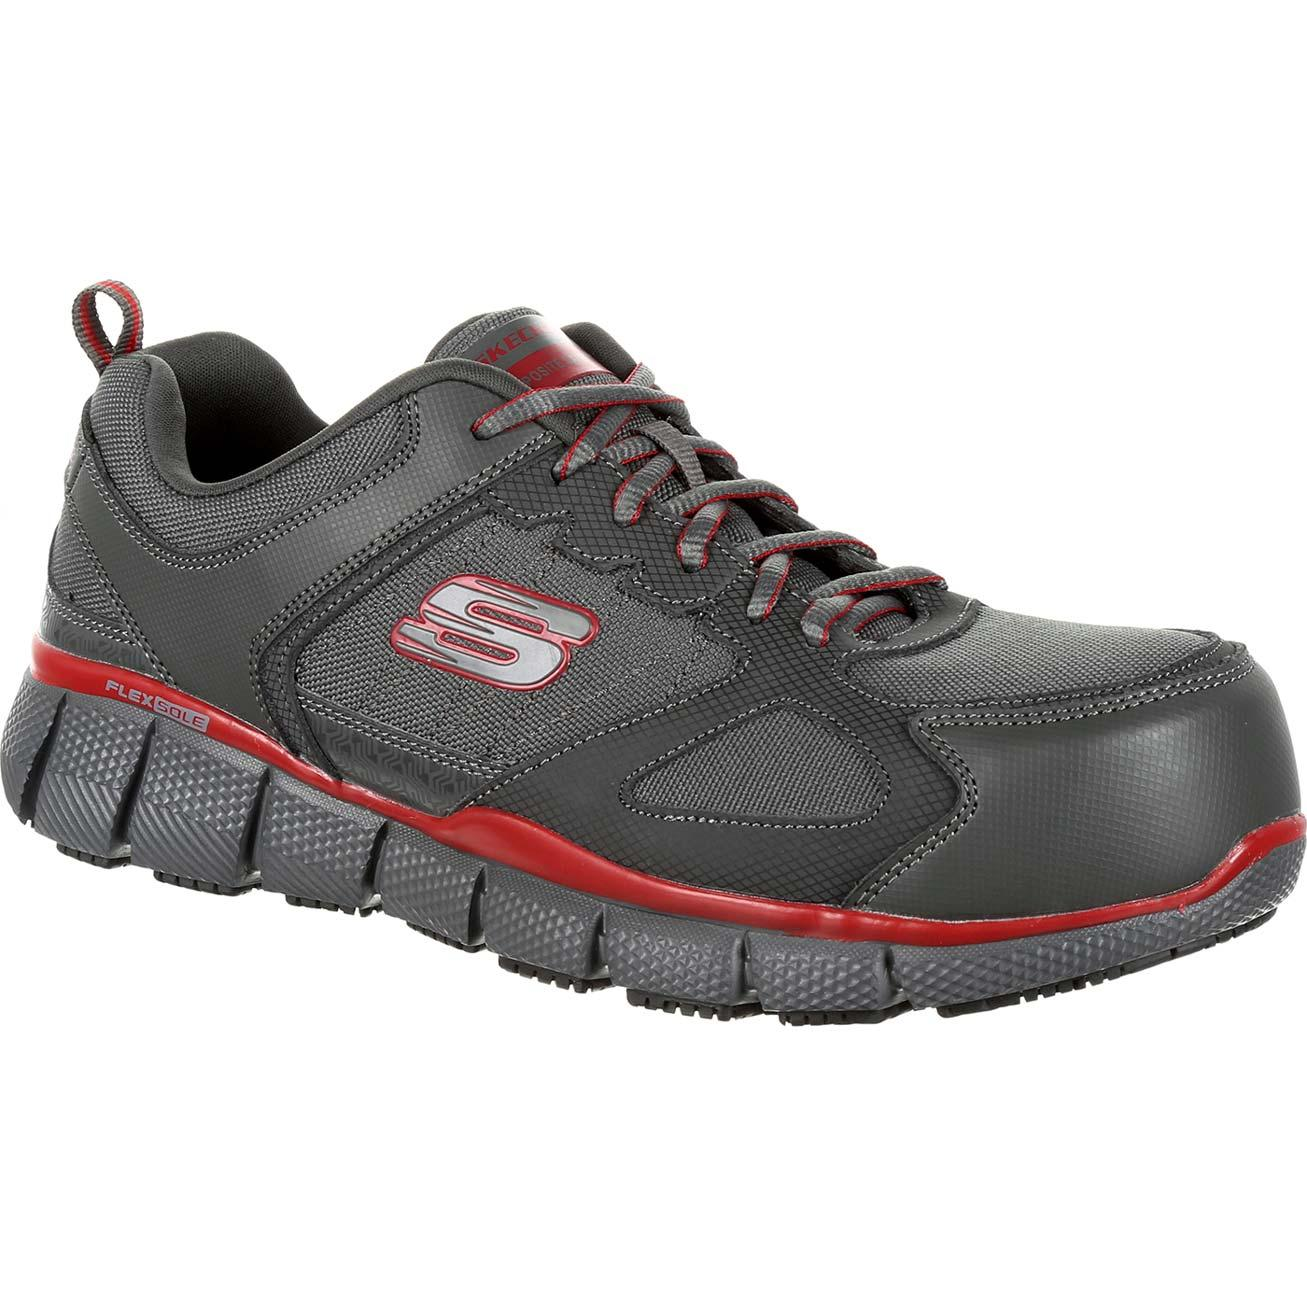 Skechers Slip Resistant Black Shoes